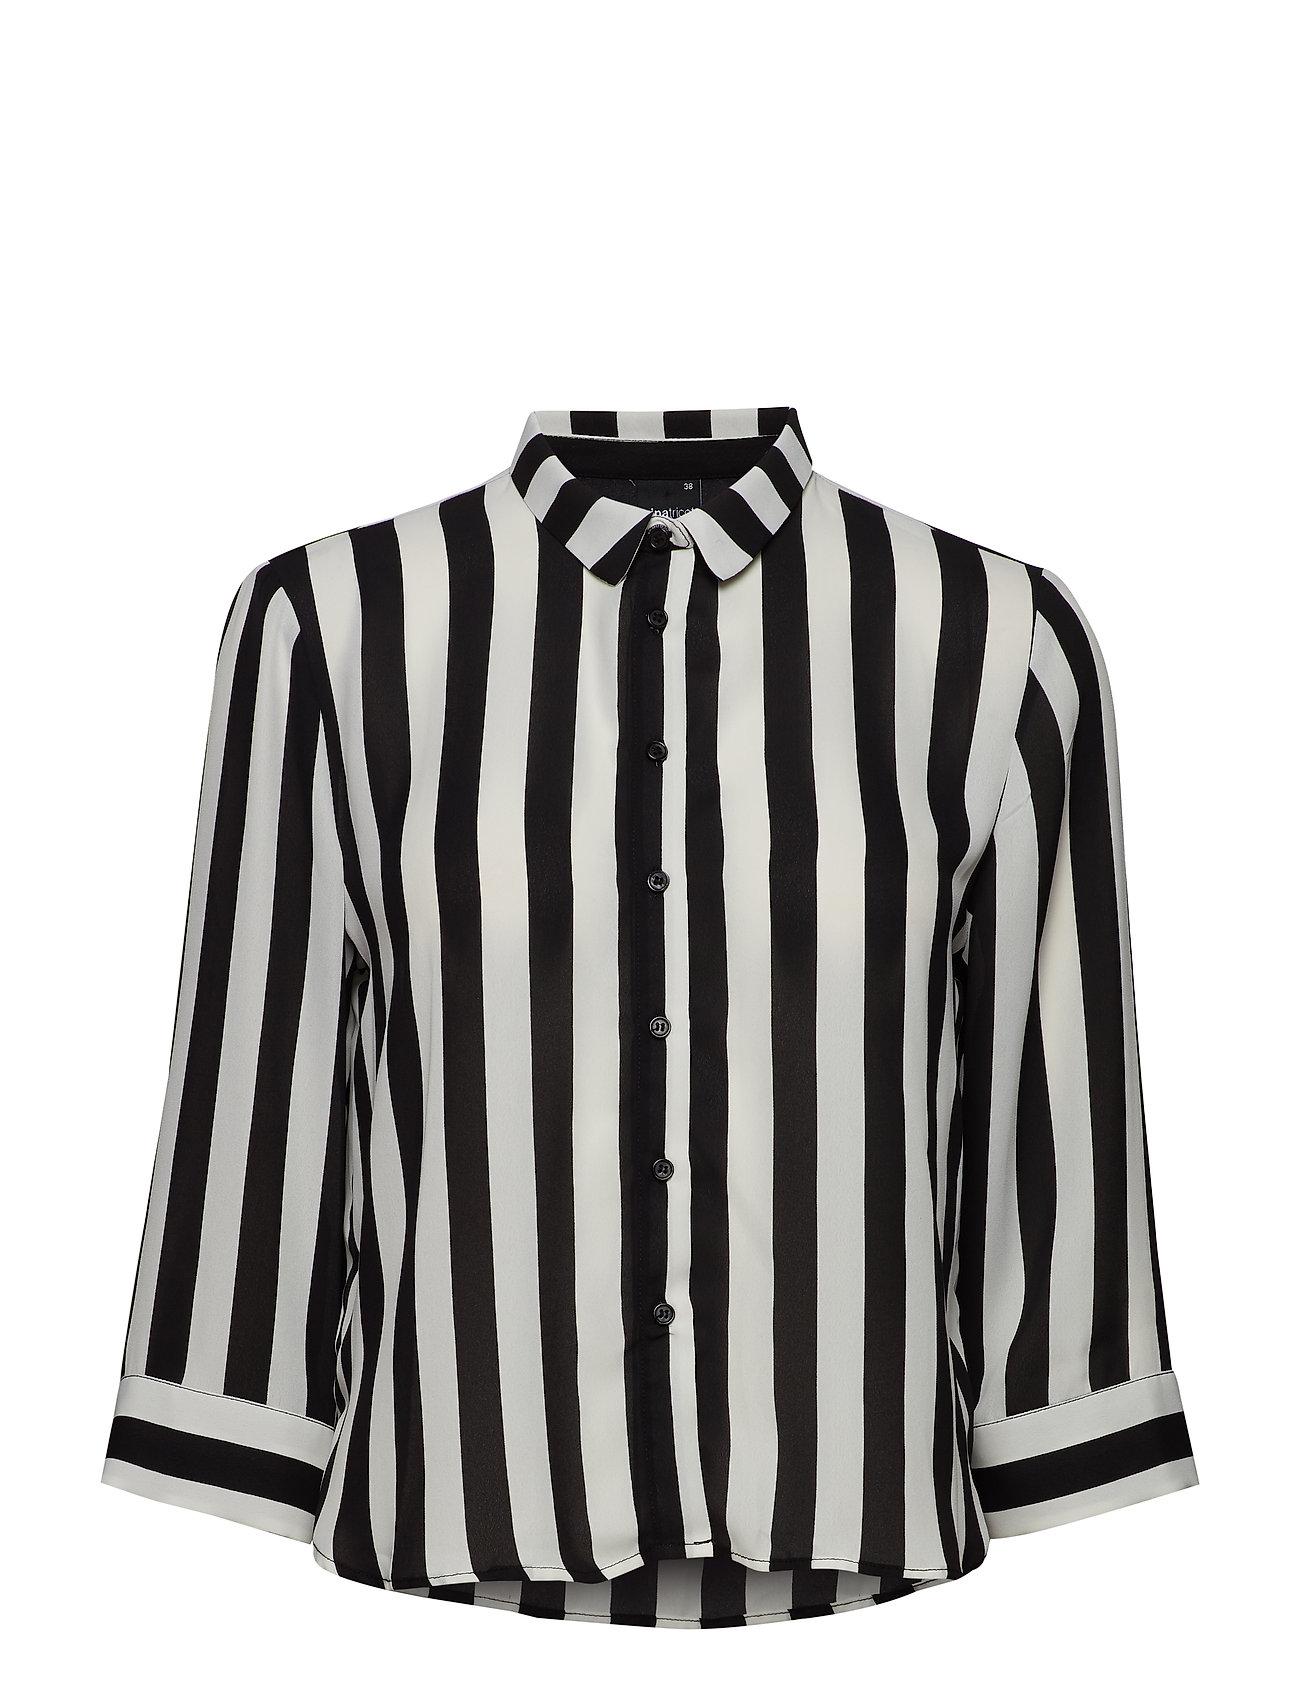 Gina Tricot Kajsa shirt Ögrönlar